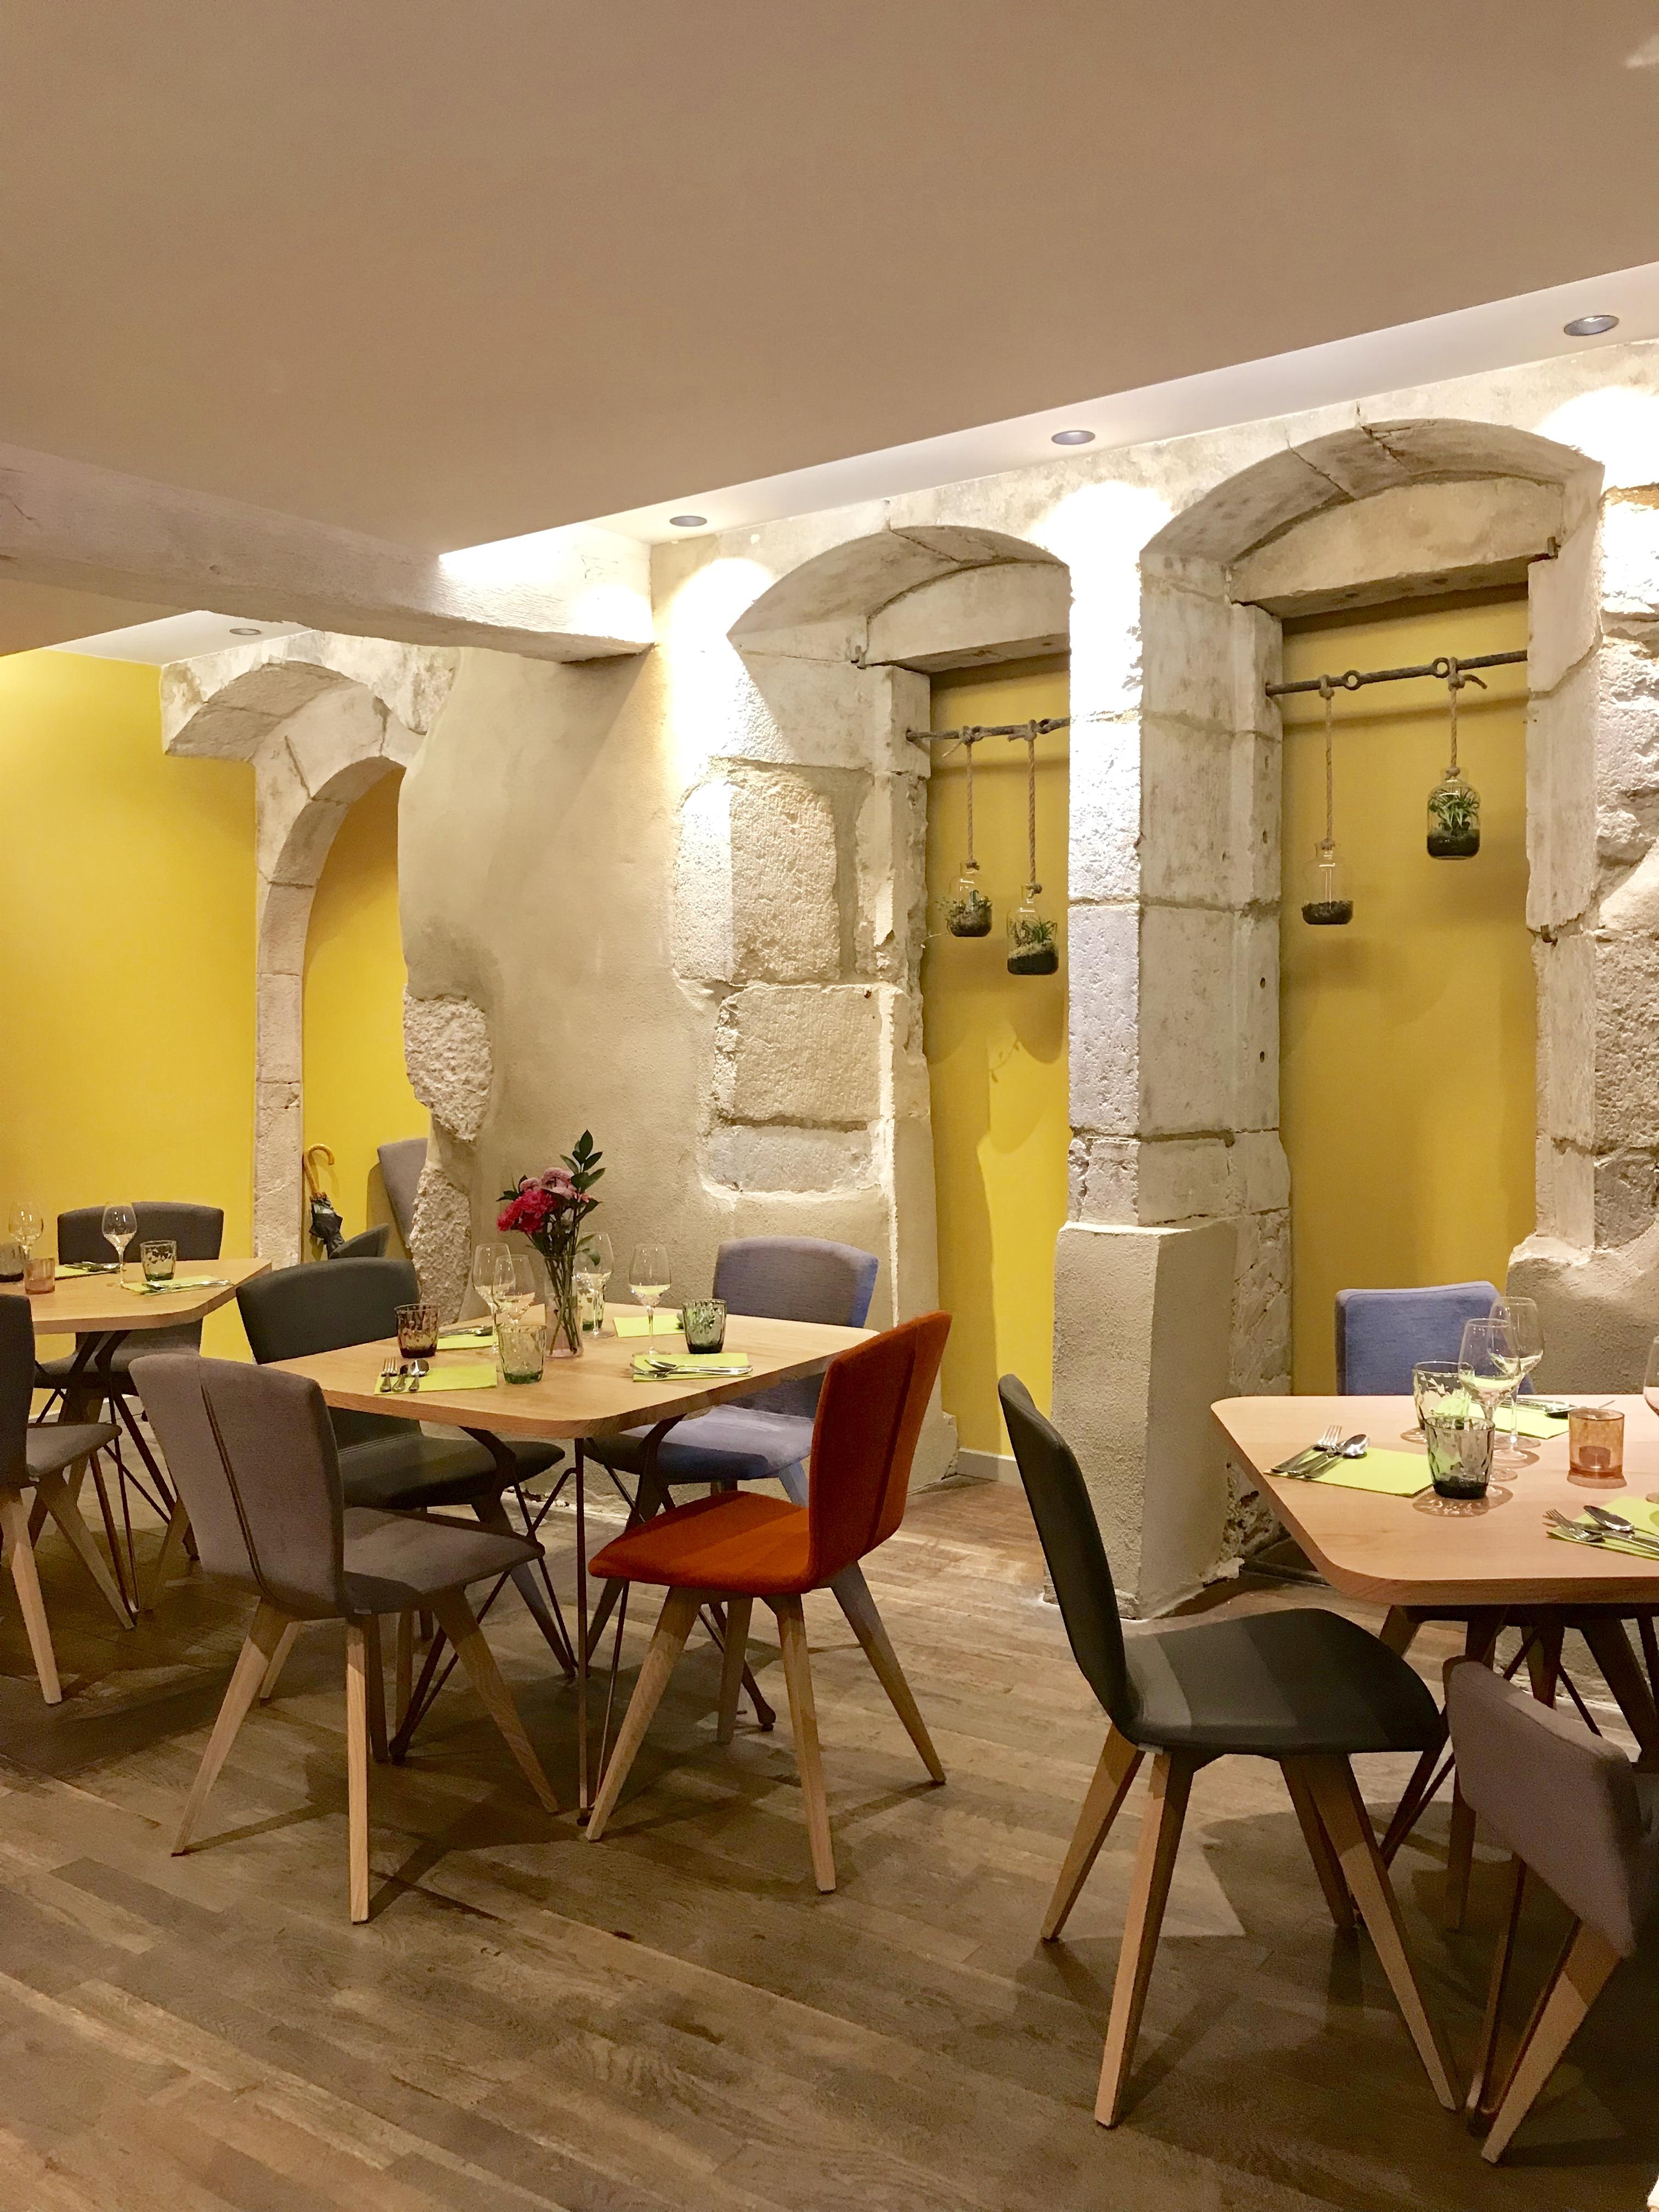 The interior at Aromatik Restaurant Annecy